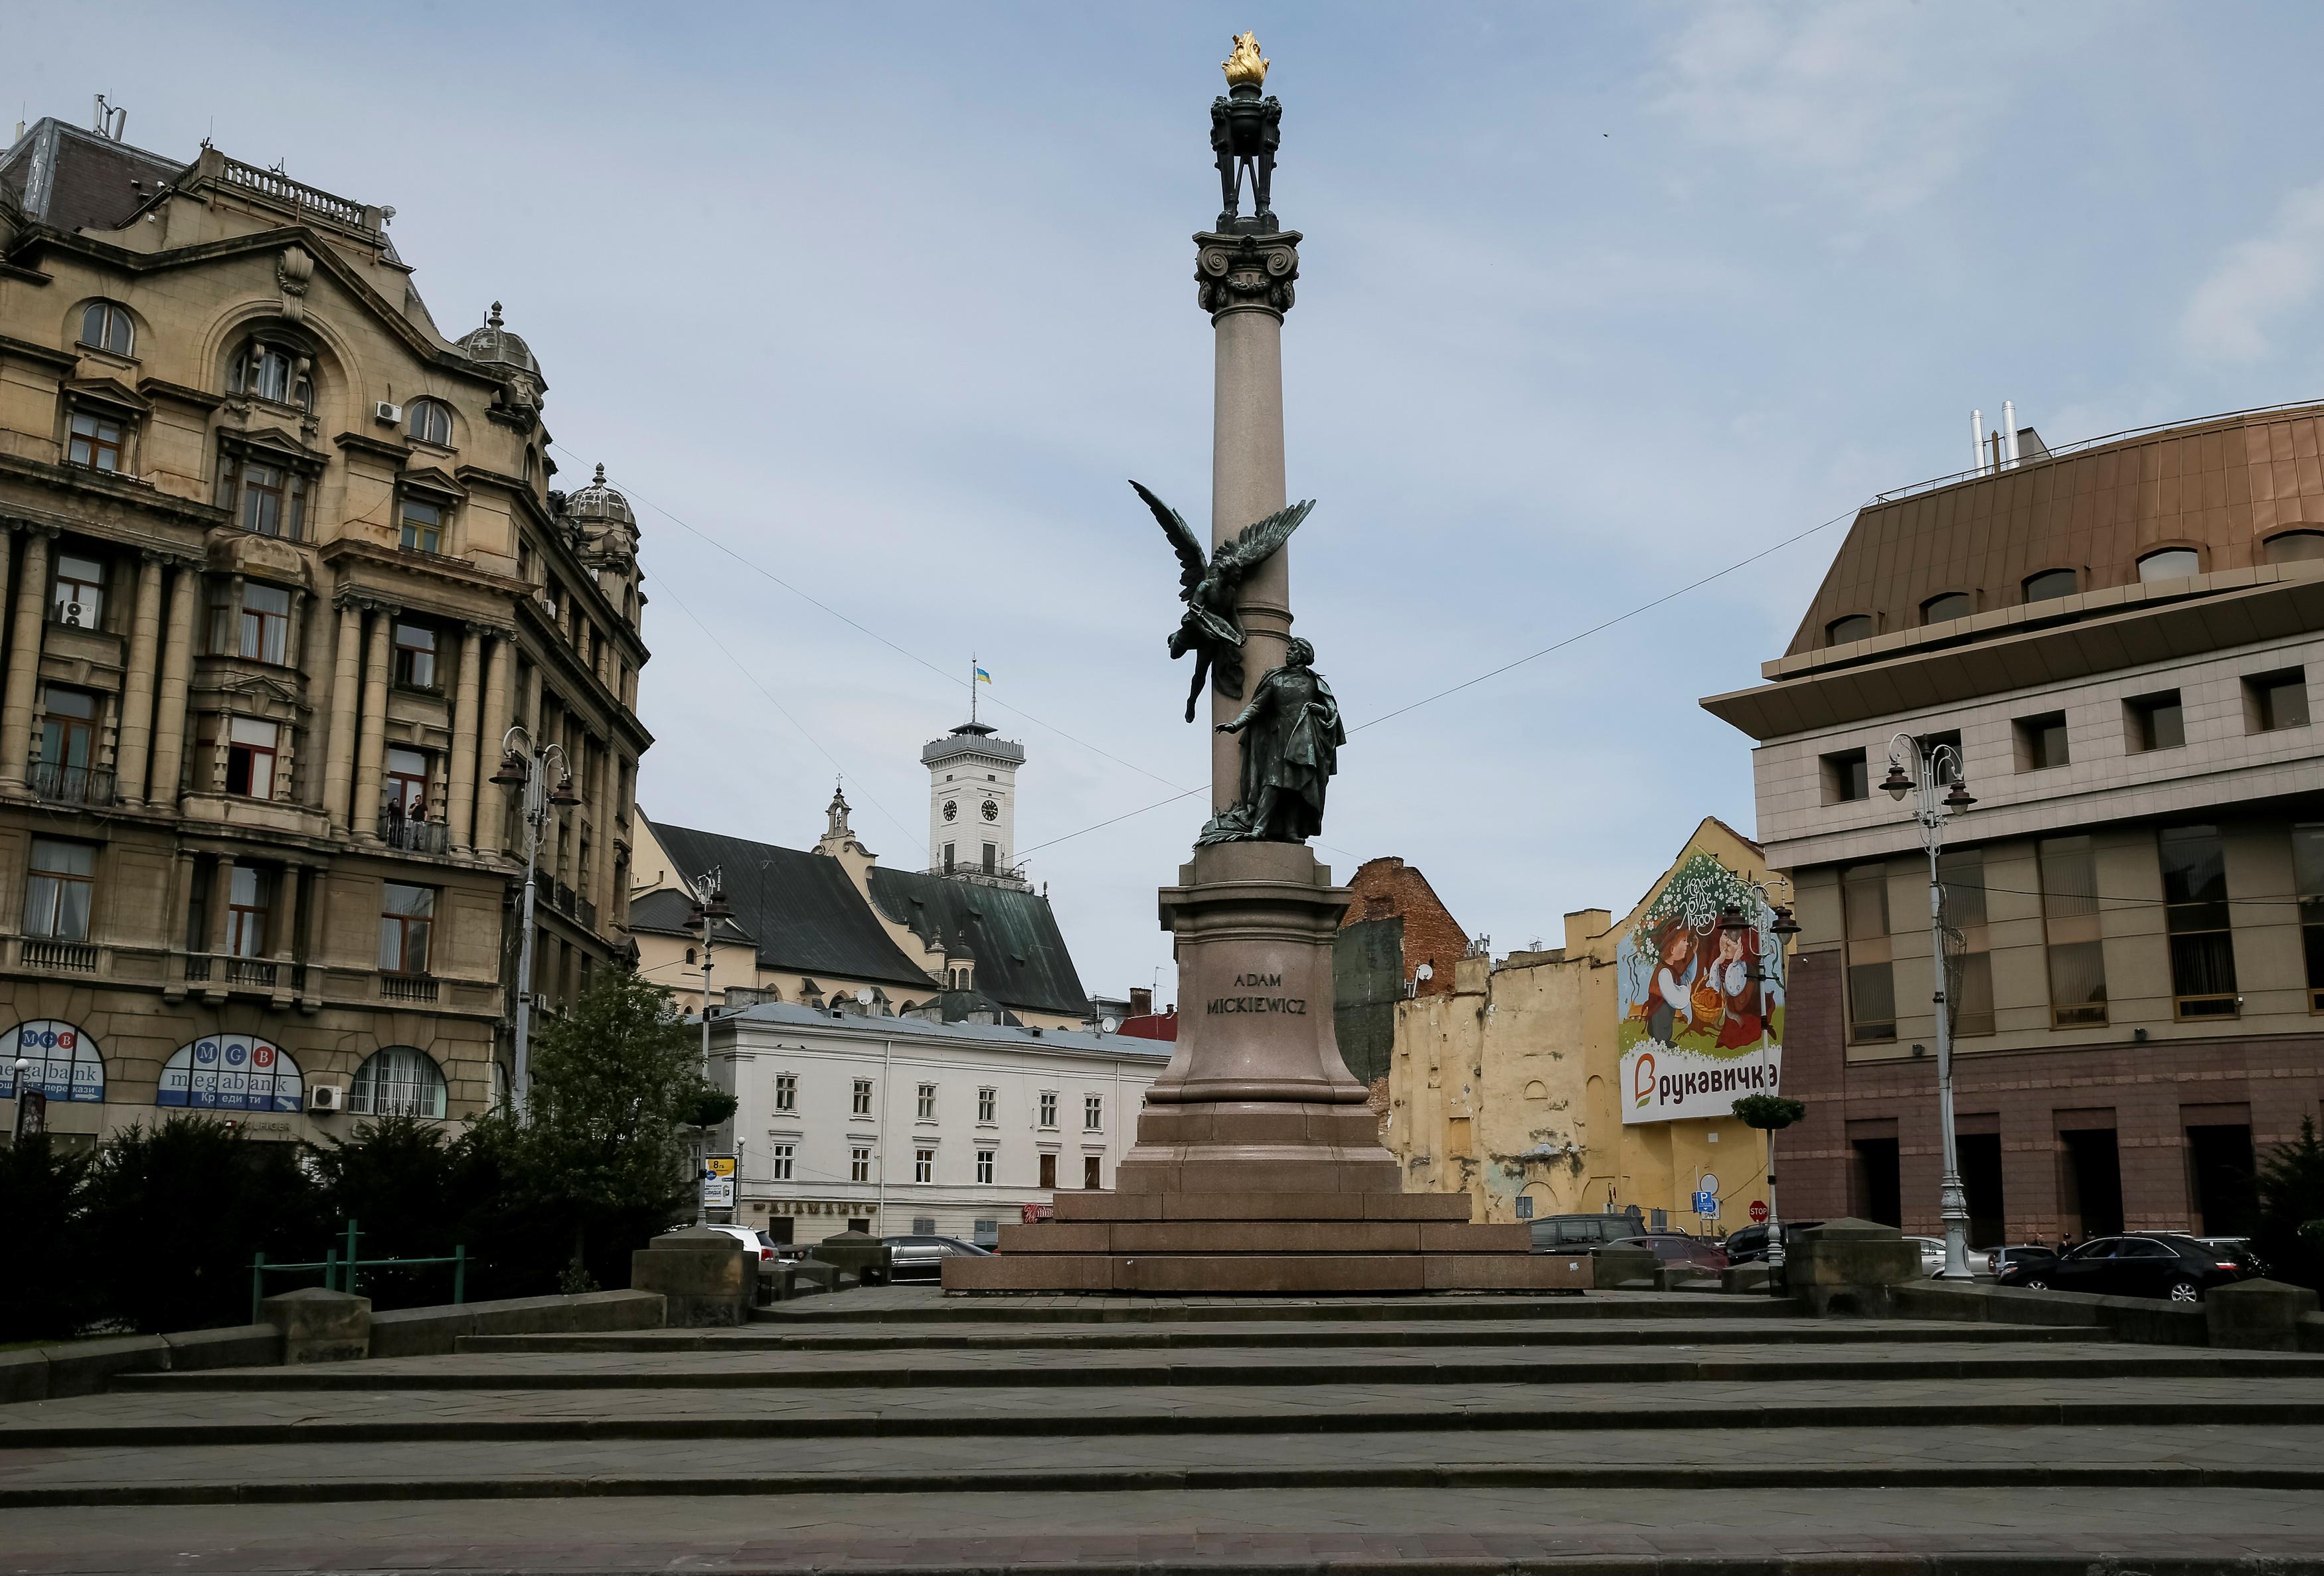 The monument of Polish poet Adam Mickiewicz is seen in central Lviv, Ukraine, April 29, 2016.  REUTERS/Gleb Garanich - D1AETCHLBPAA